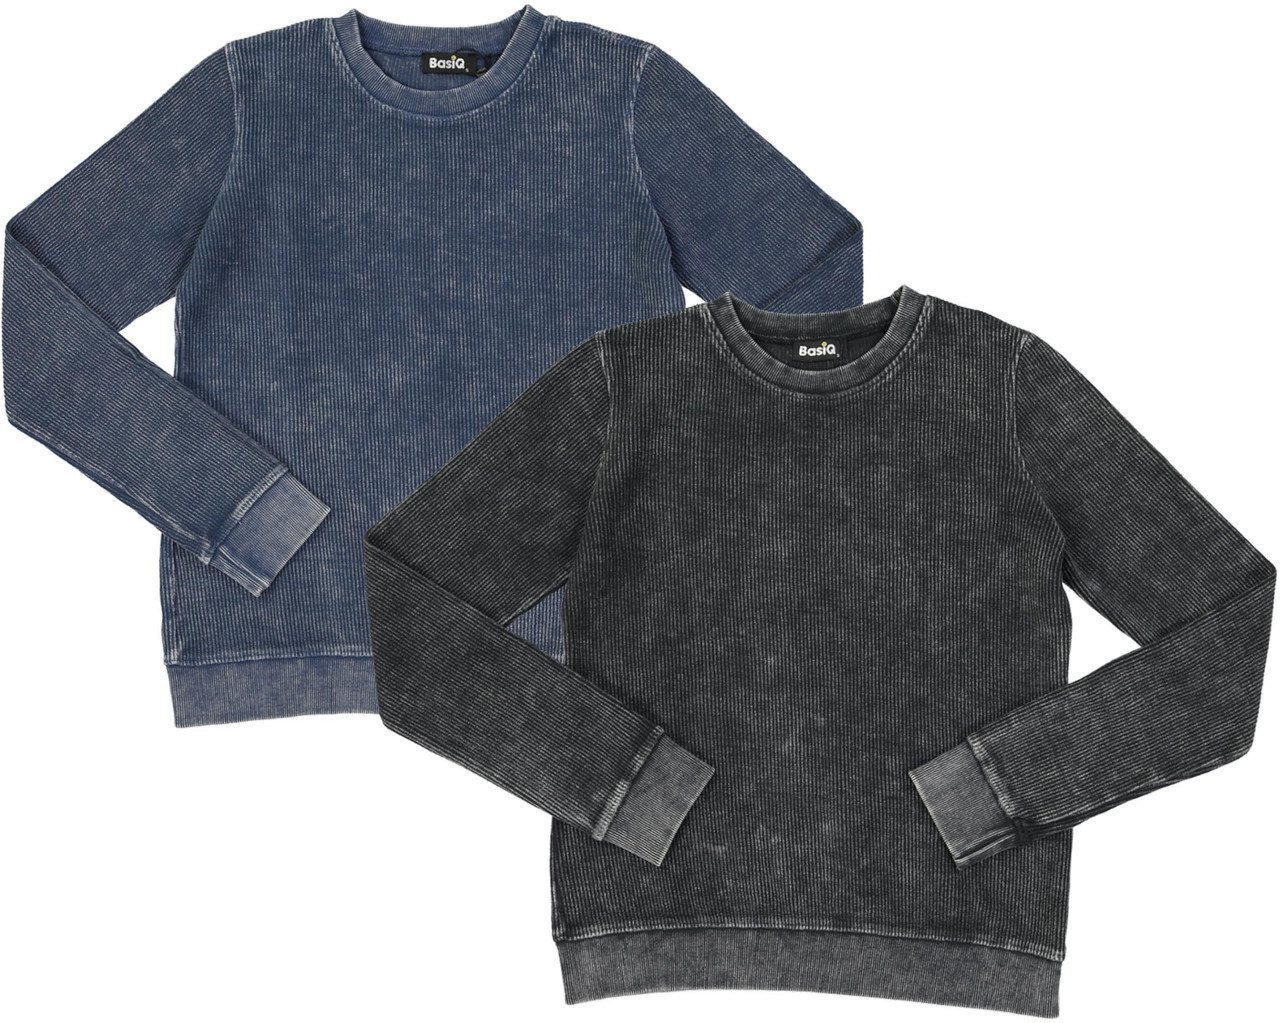 Basiq Apparel Womens Denim Wash Crew Sweatshirt - MGG01